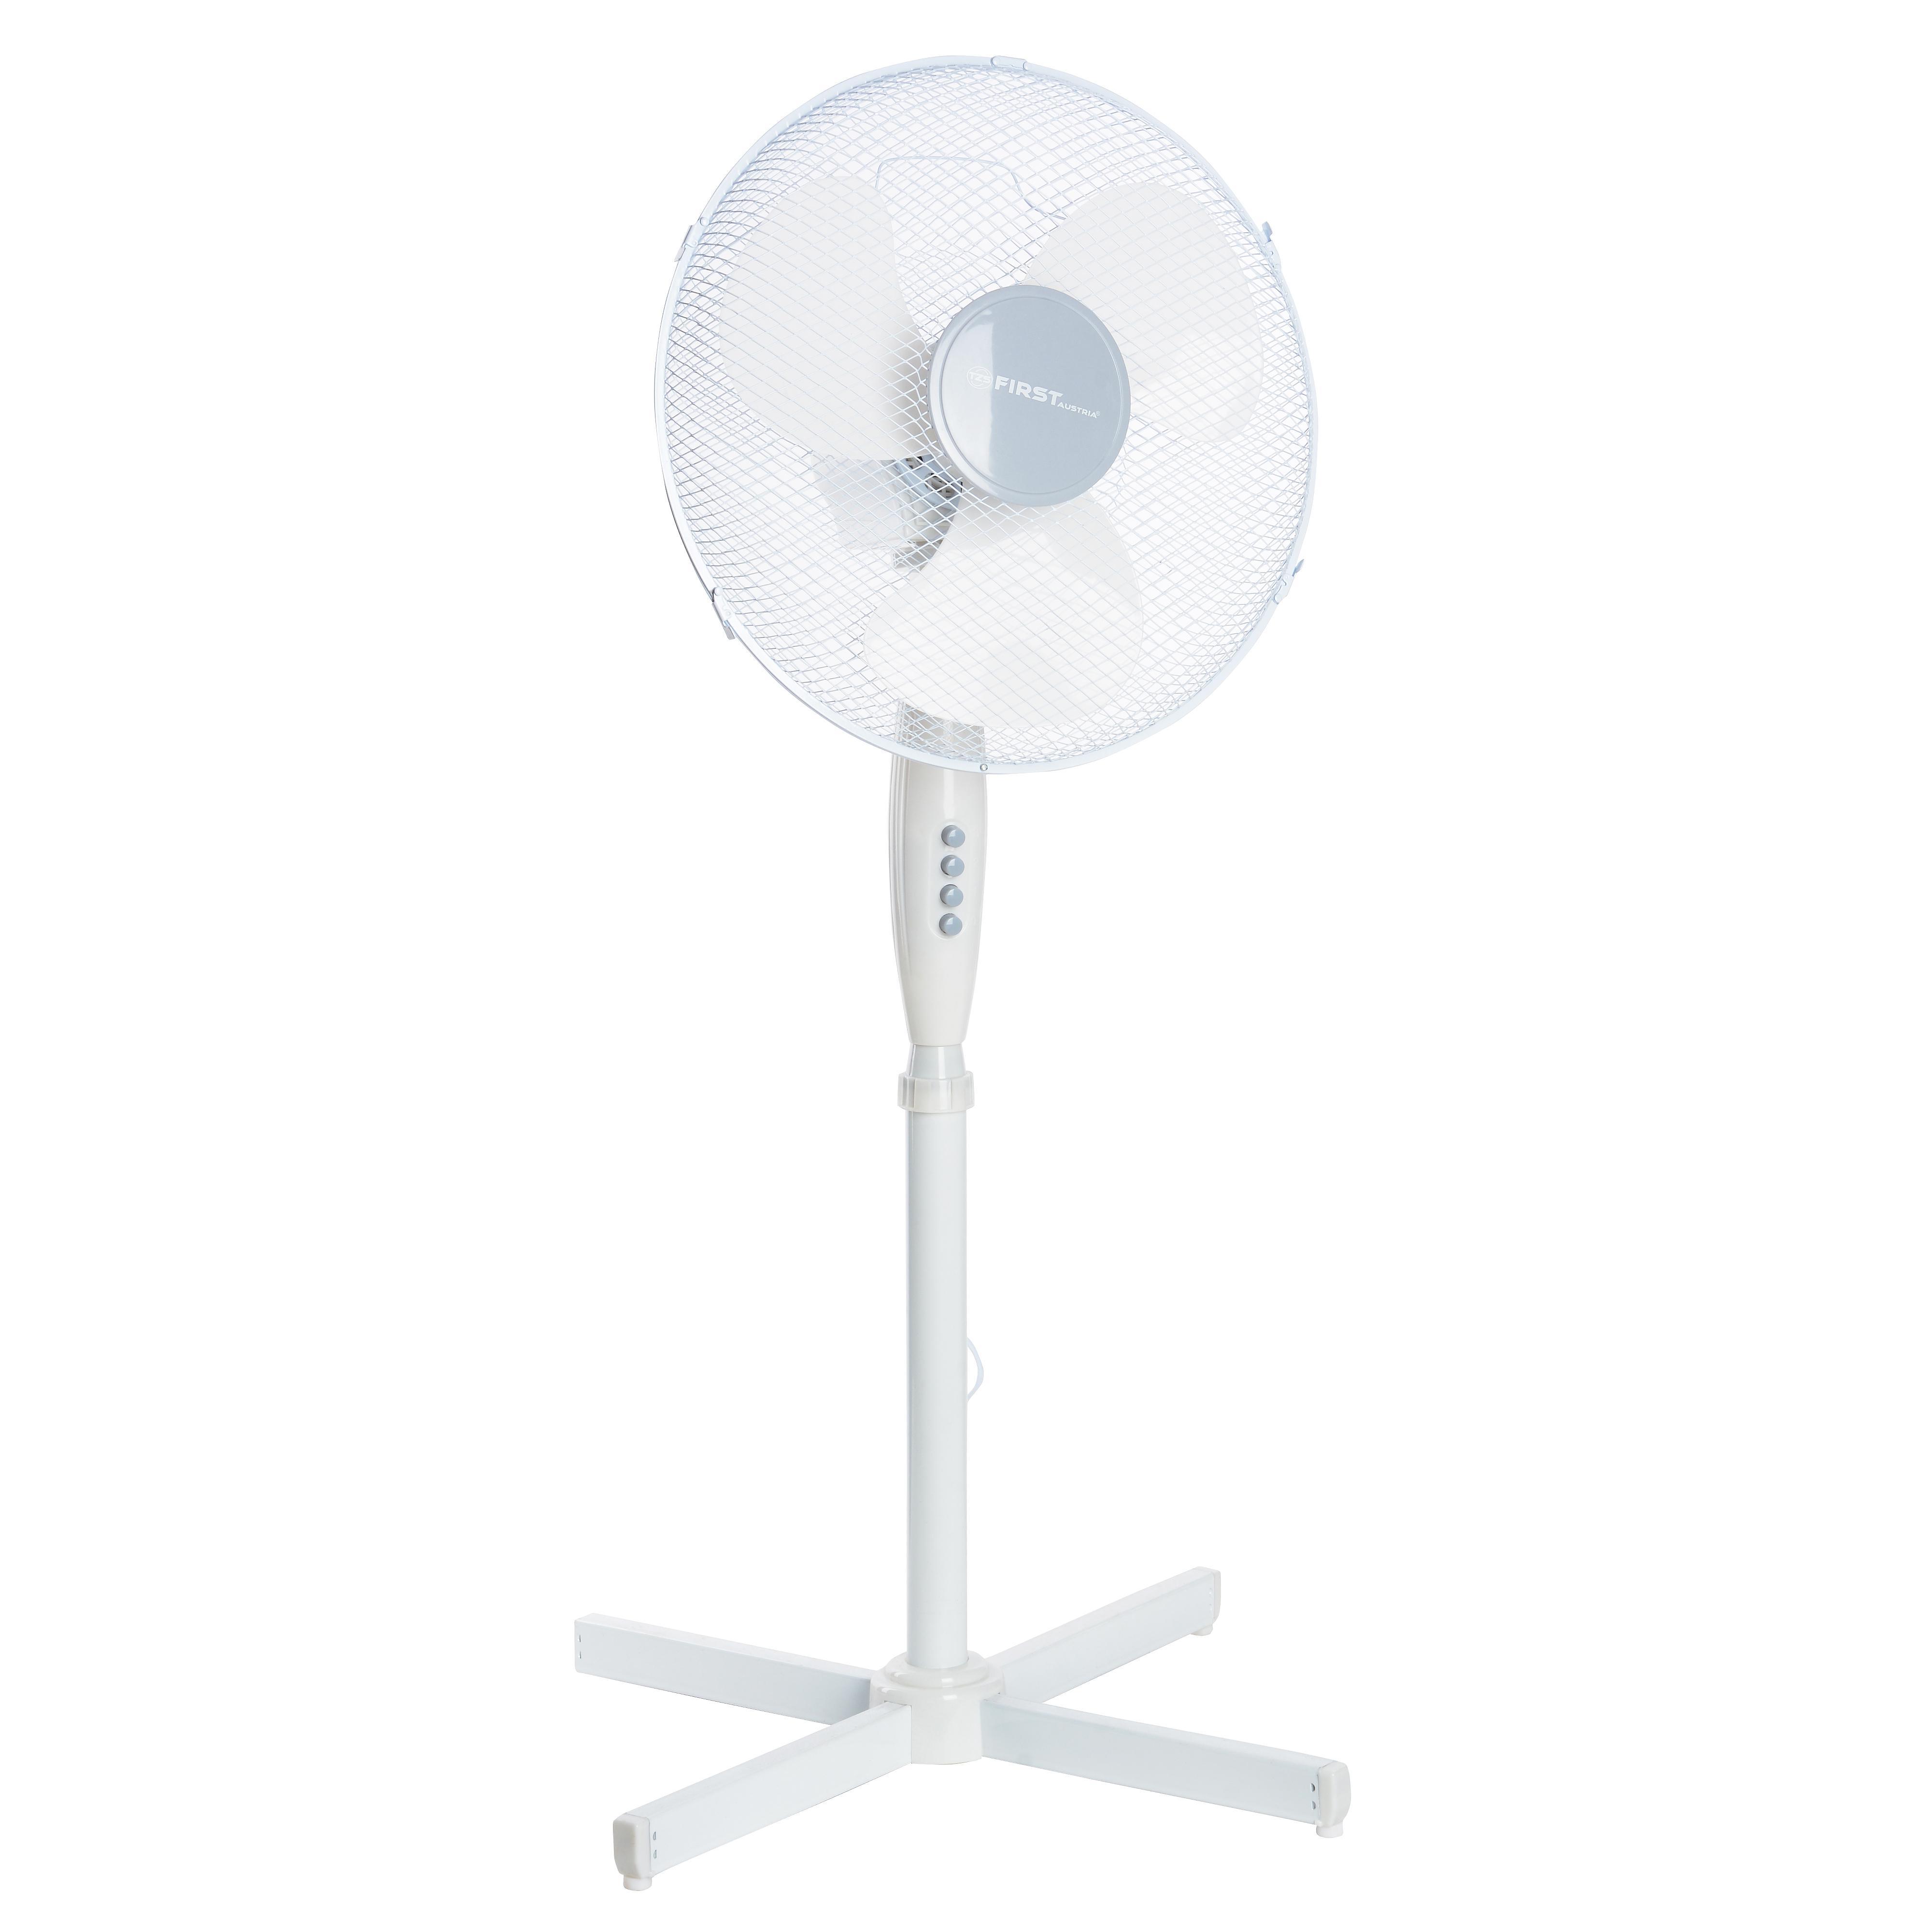 Вентилятор First Fa-5553-1 white